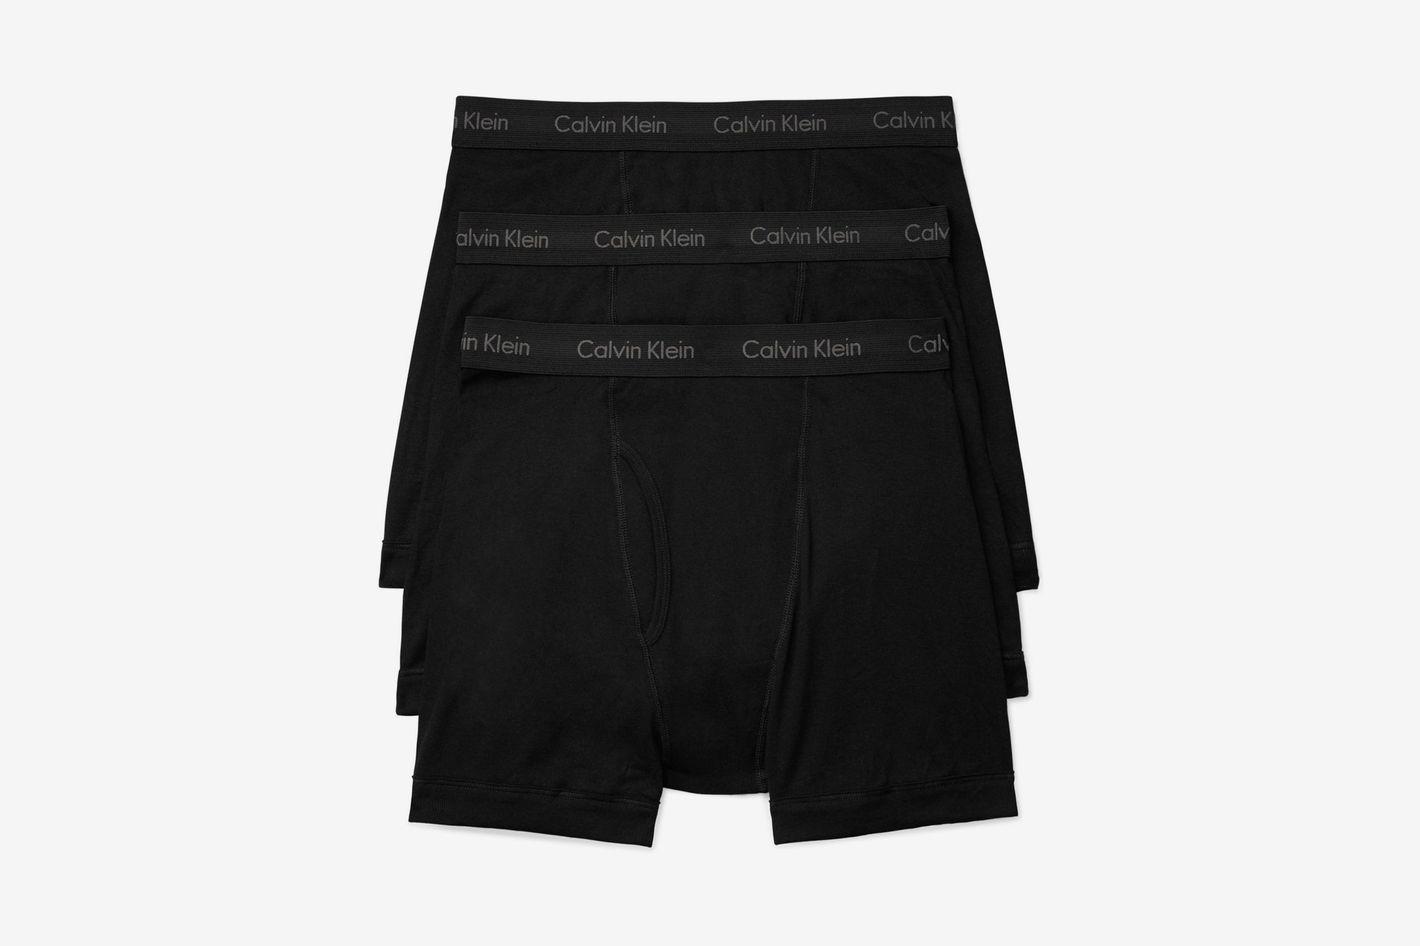 66d5d73c42 Calvin Klein Boxer Briefs (3-pack) at Nordstrom